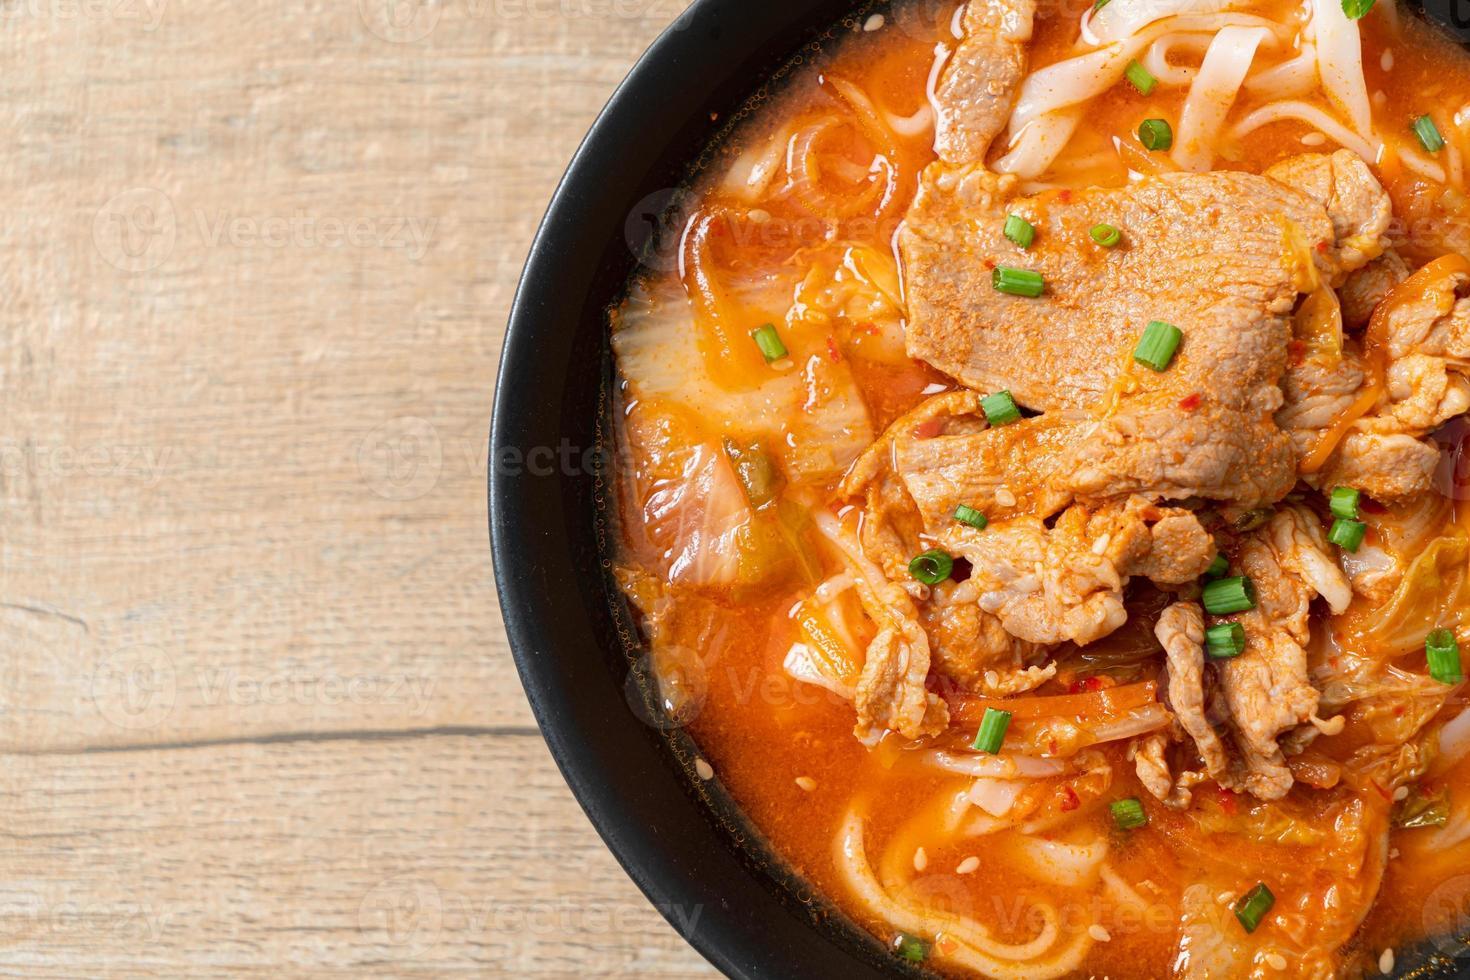 Korean udon ramen noodles with pork in kimchi soup photo